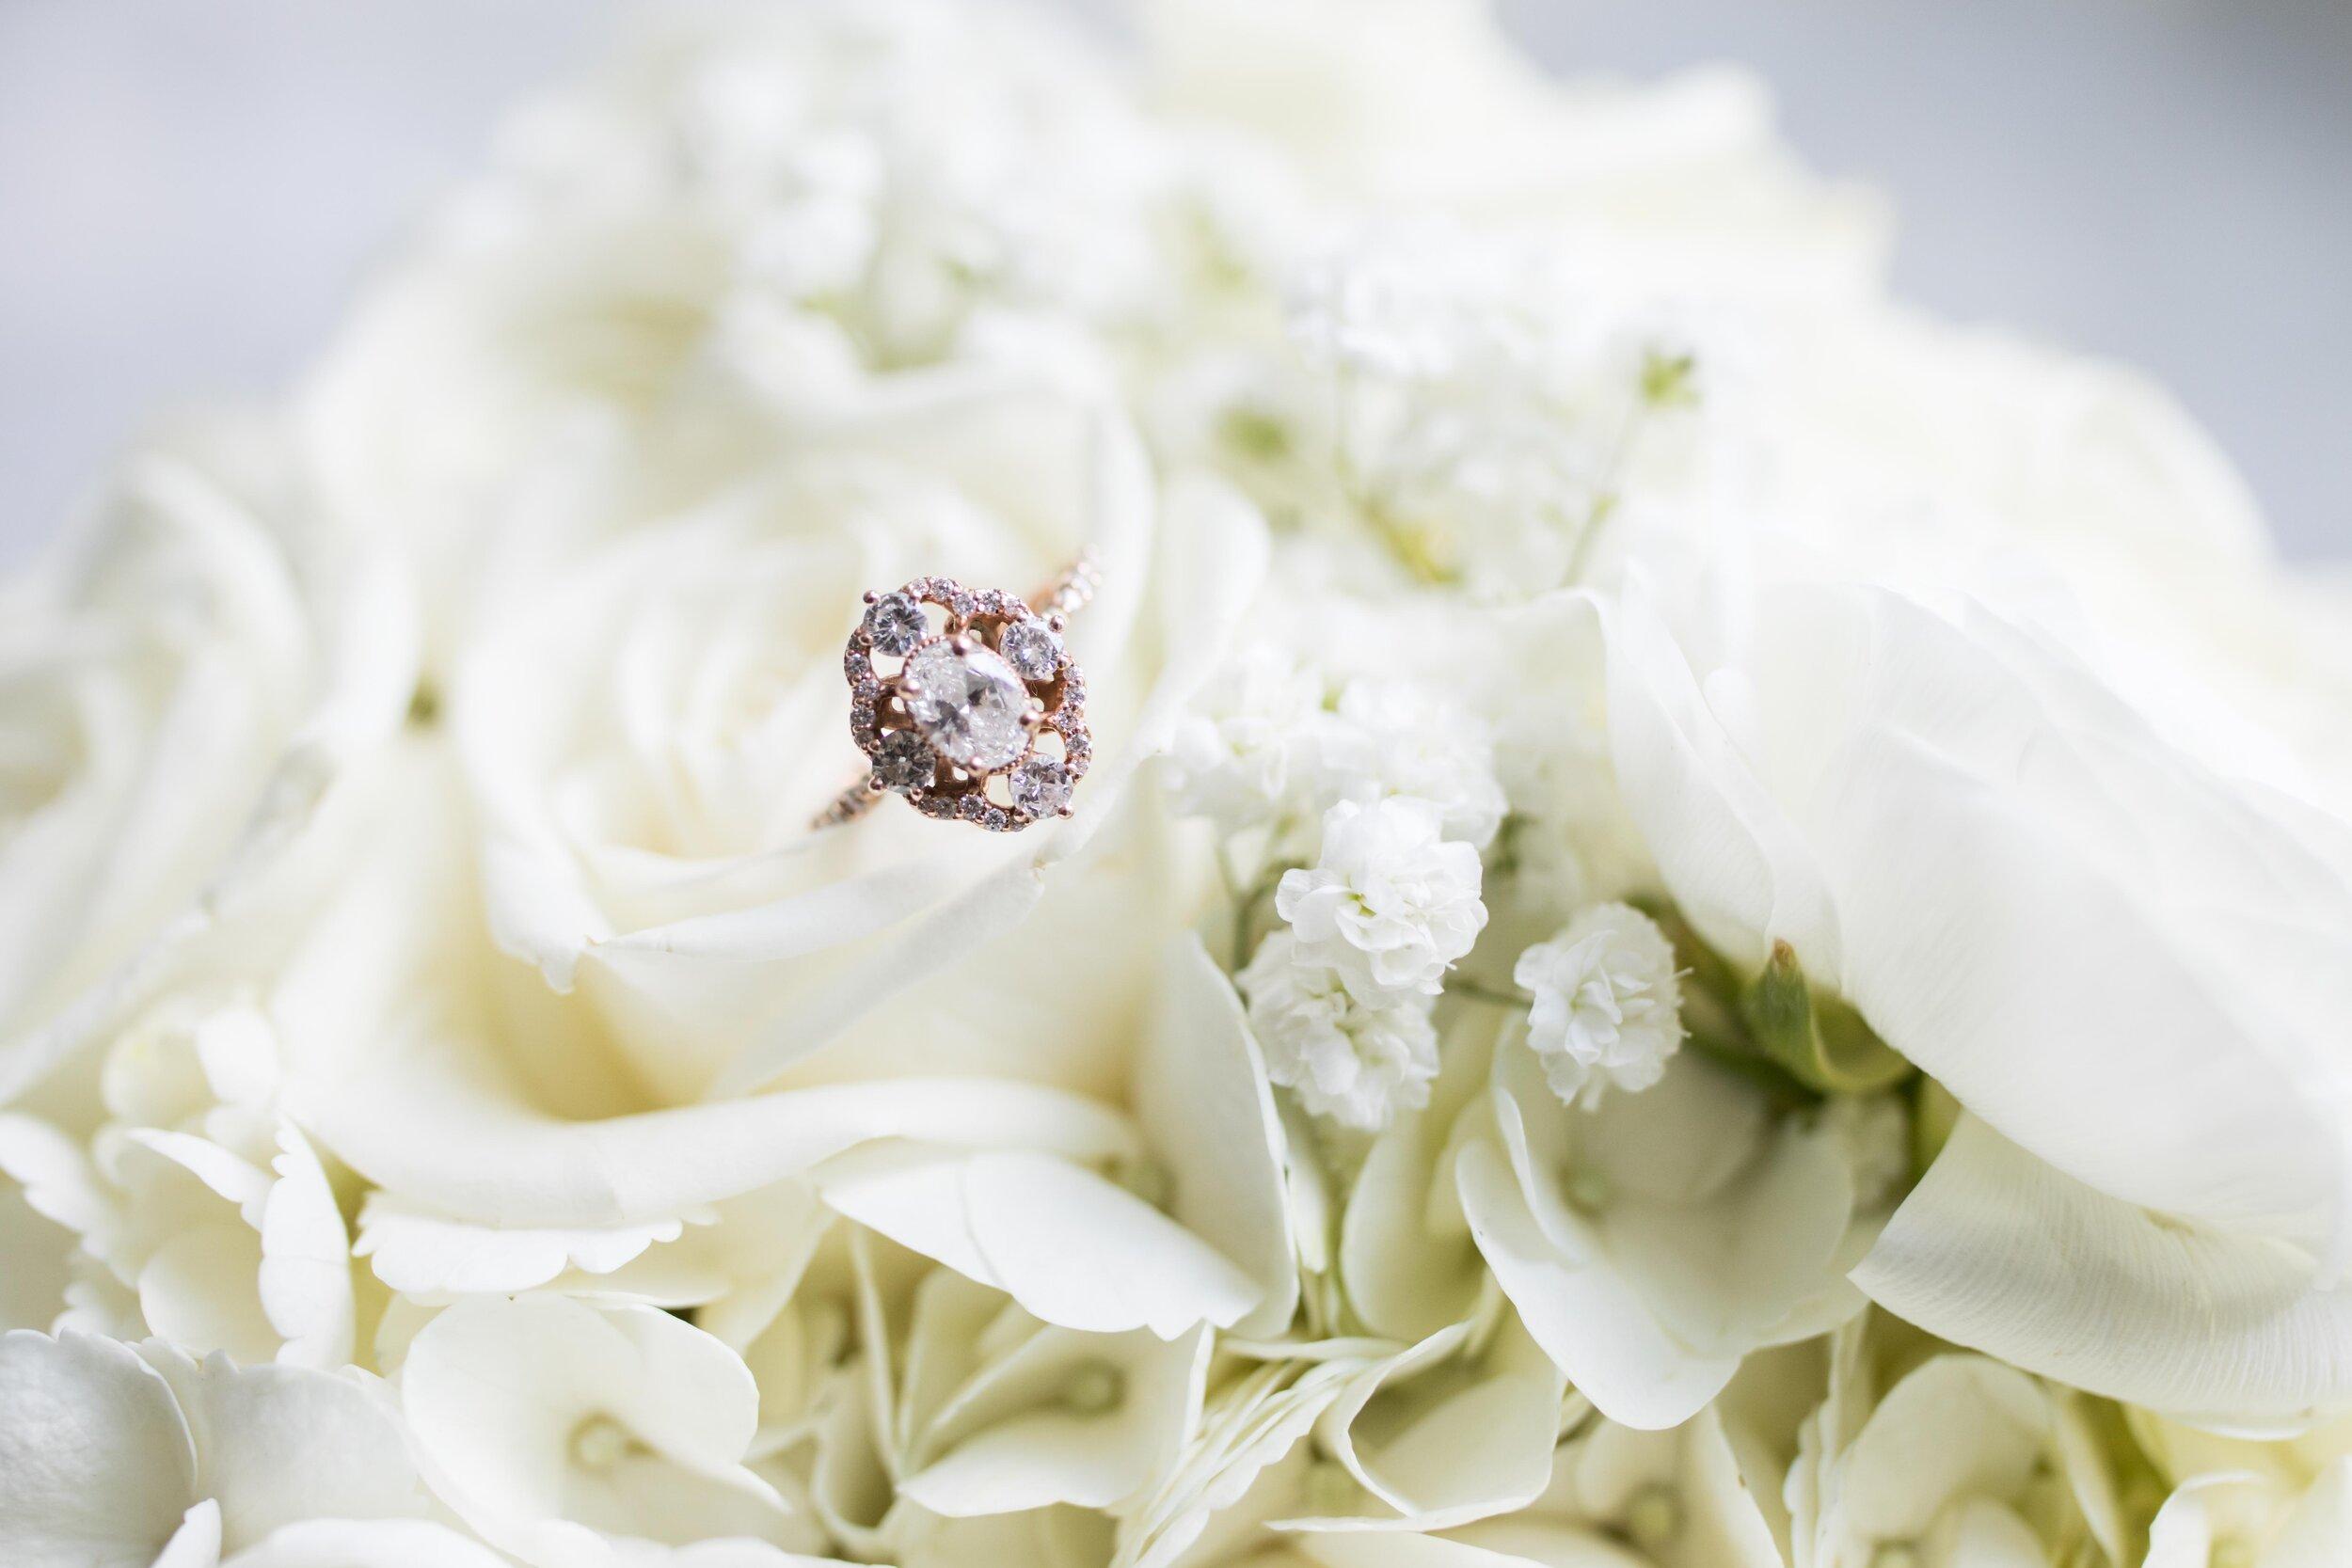 8_3_2019_BONTY_WEDDING-42.jpg